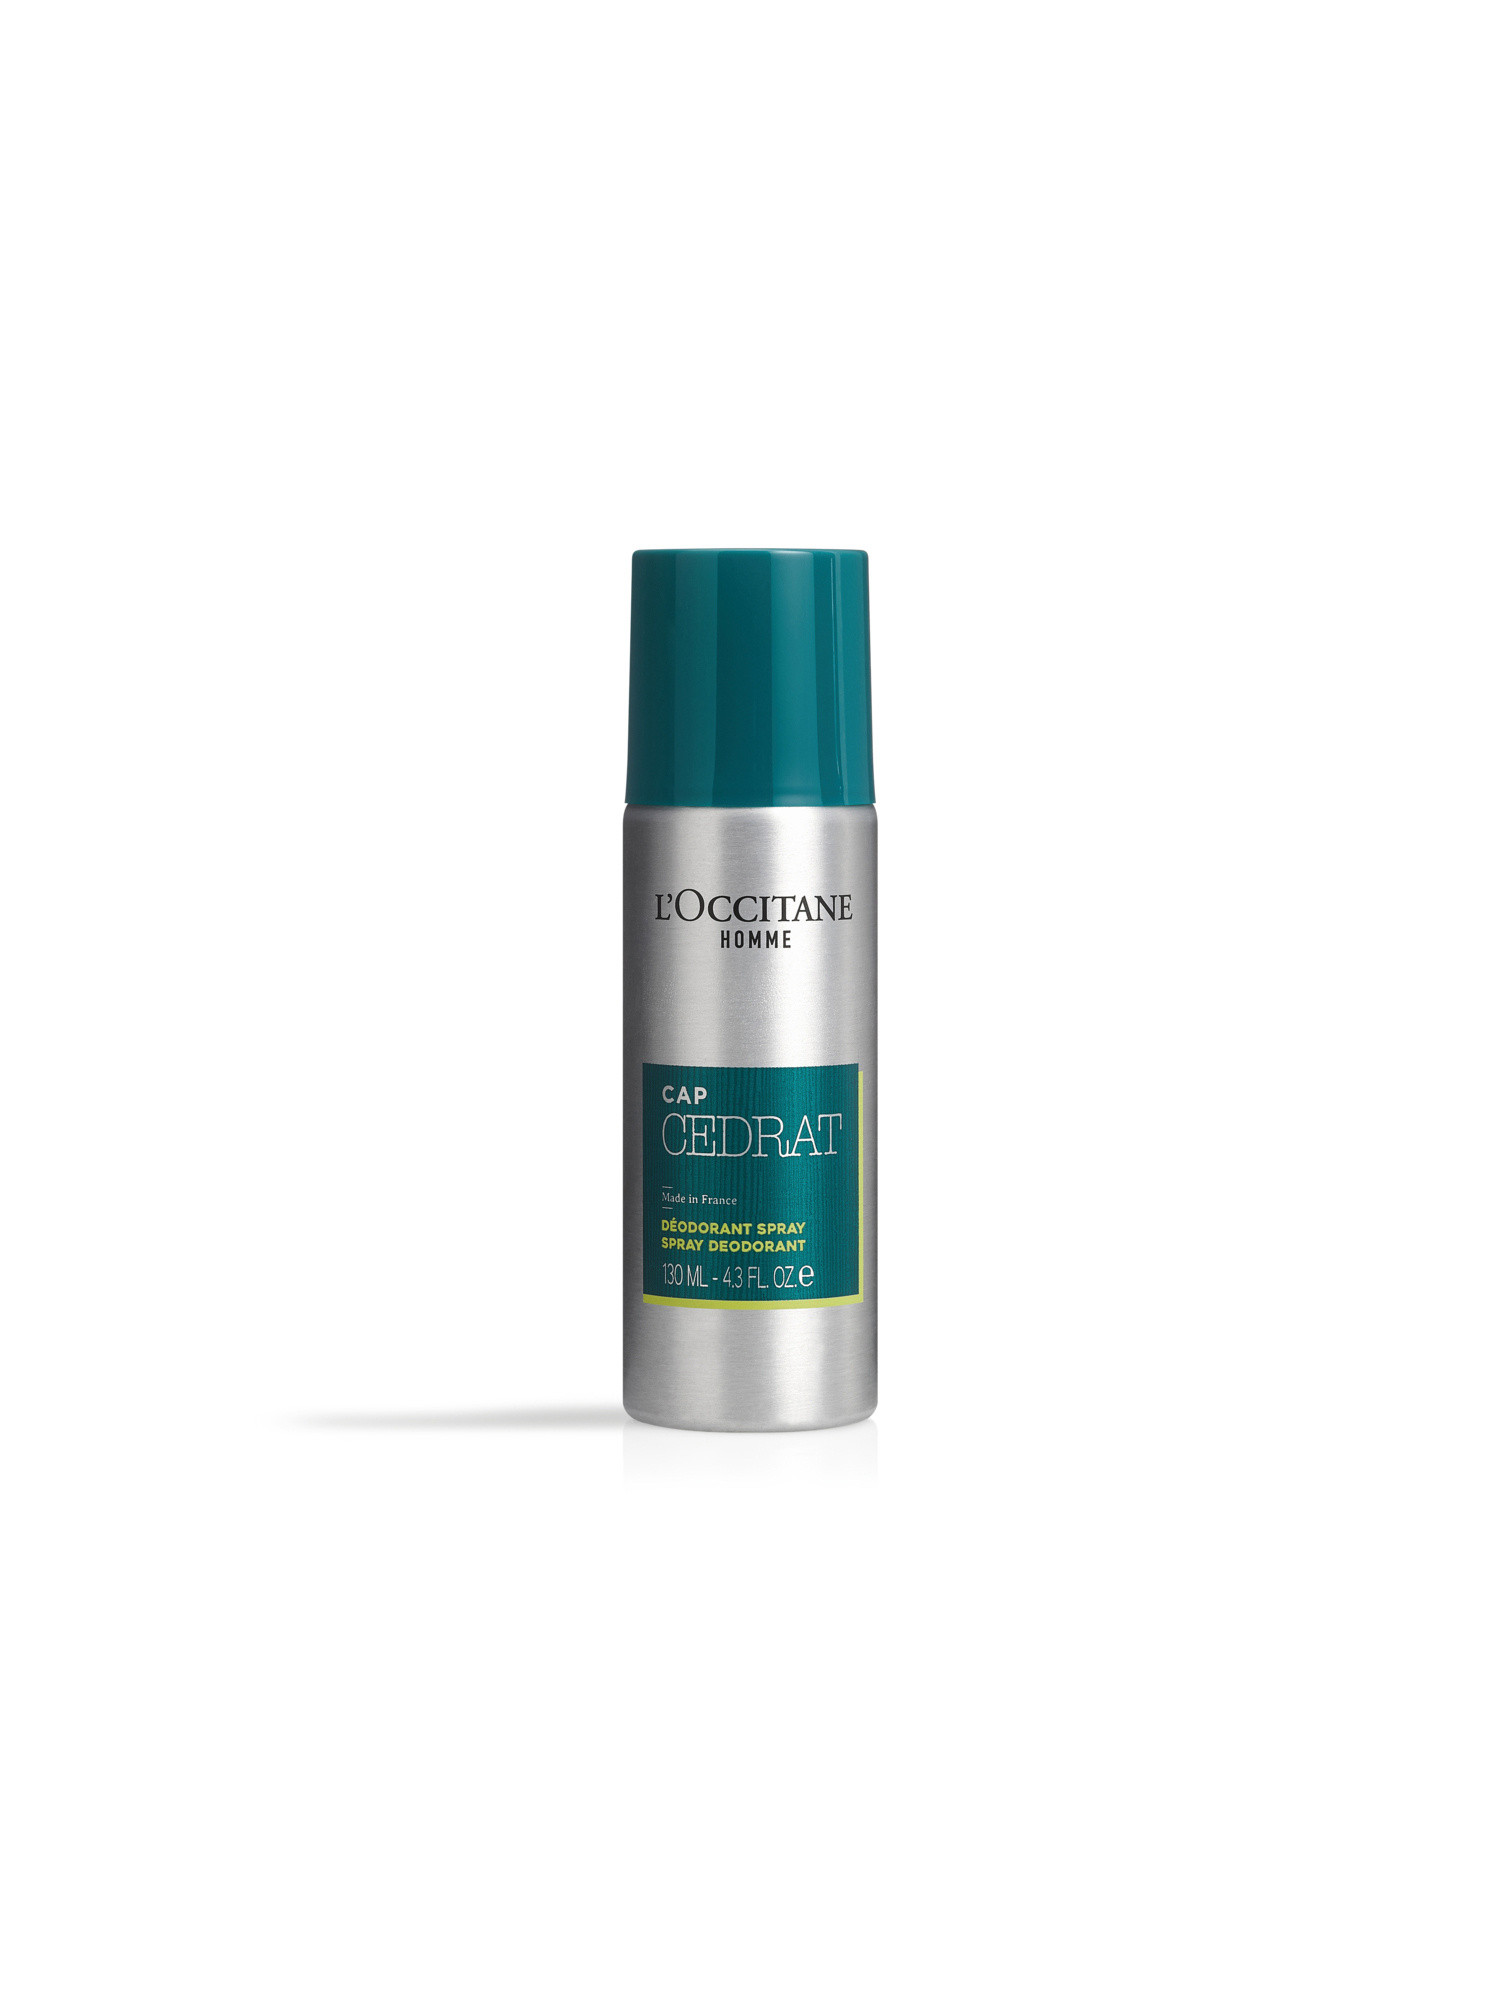 Deodorante Spray Cap Cedrat 130 ml, Trasparente, large image number 0